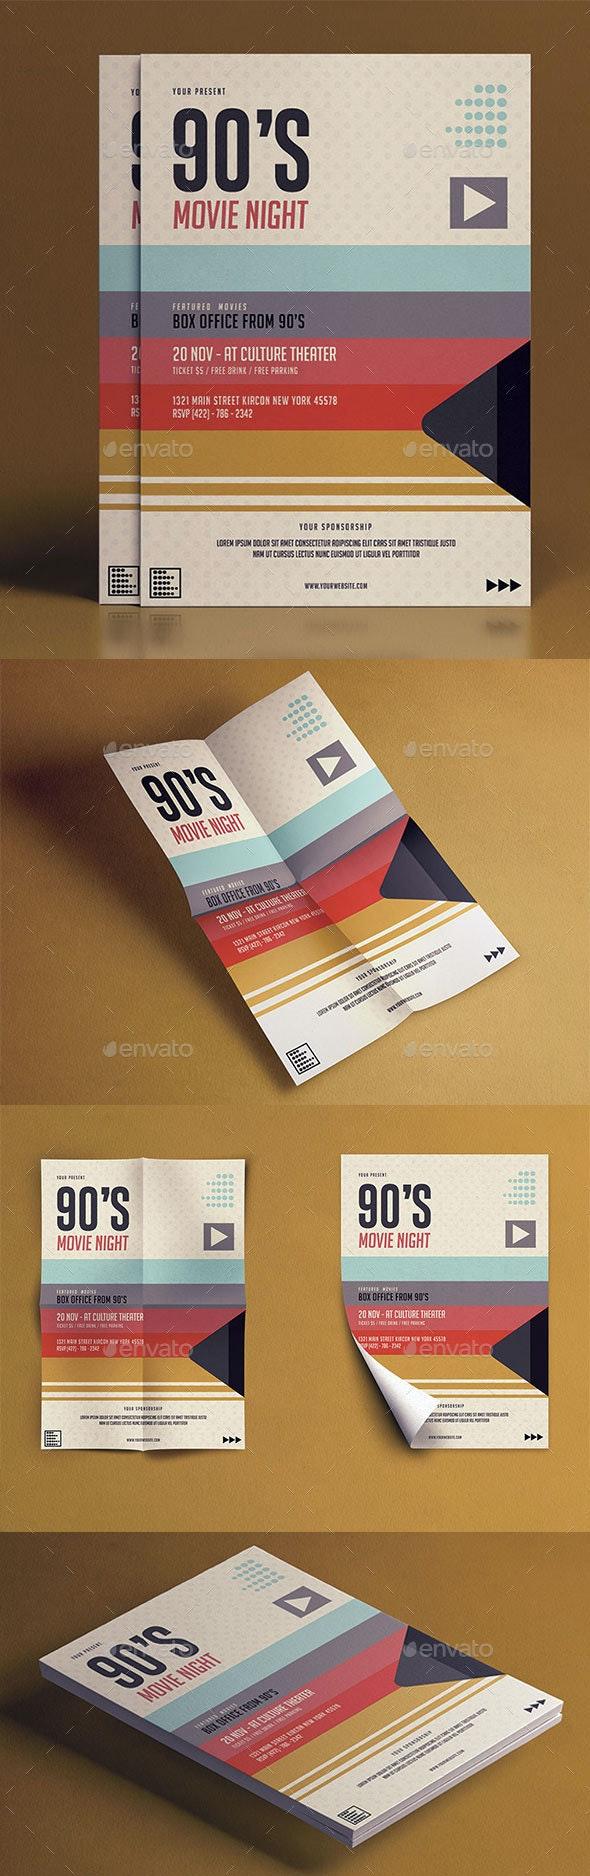 90's Movie Night Flyer - Brochures Print Templates